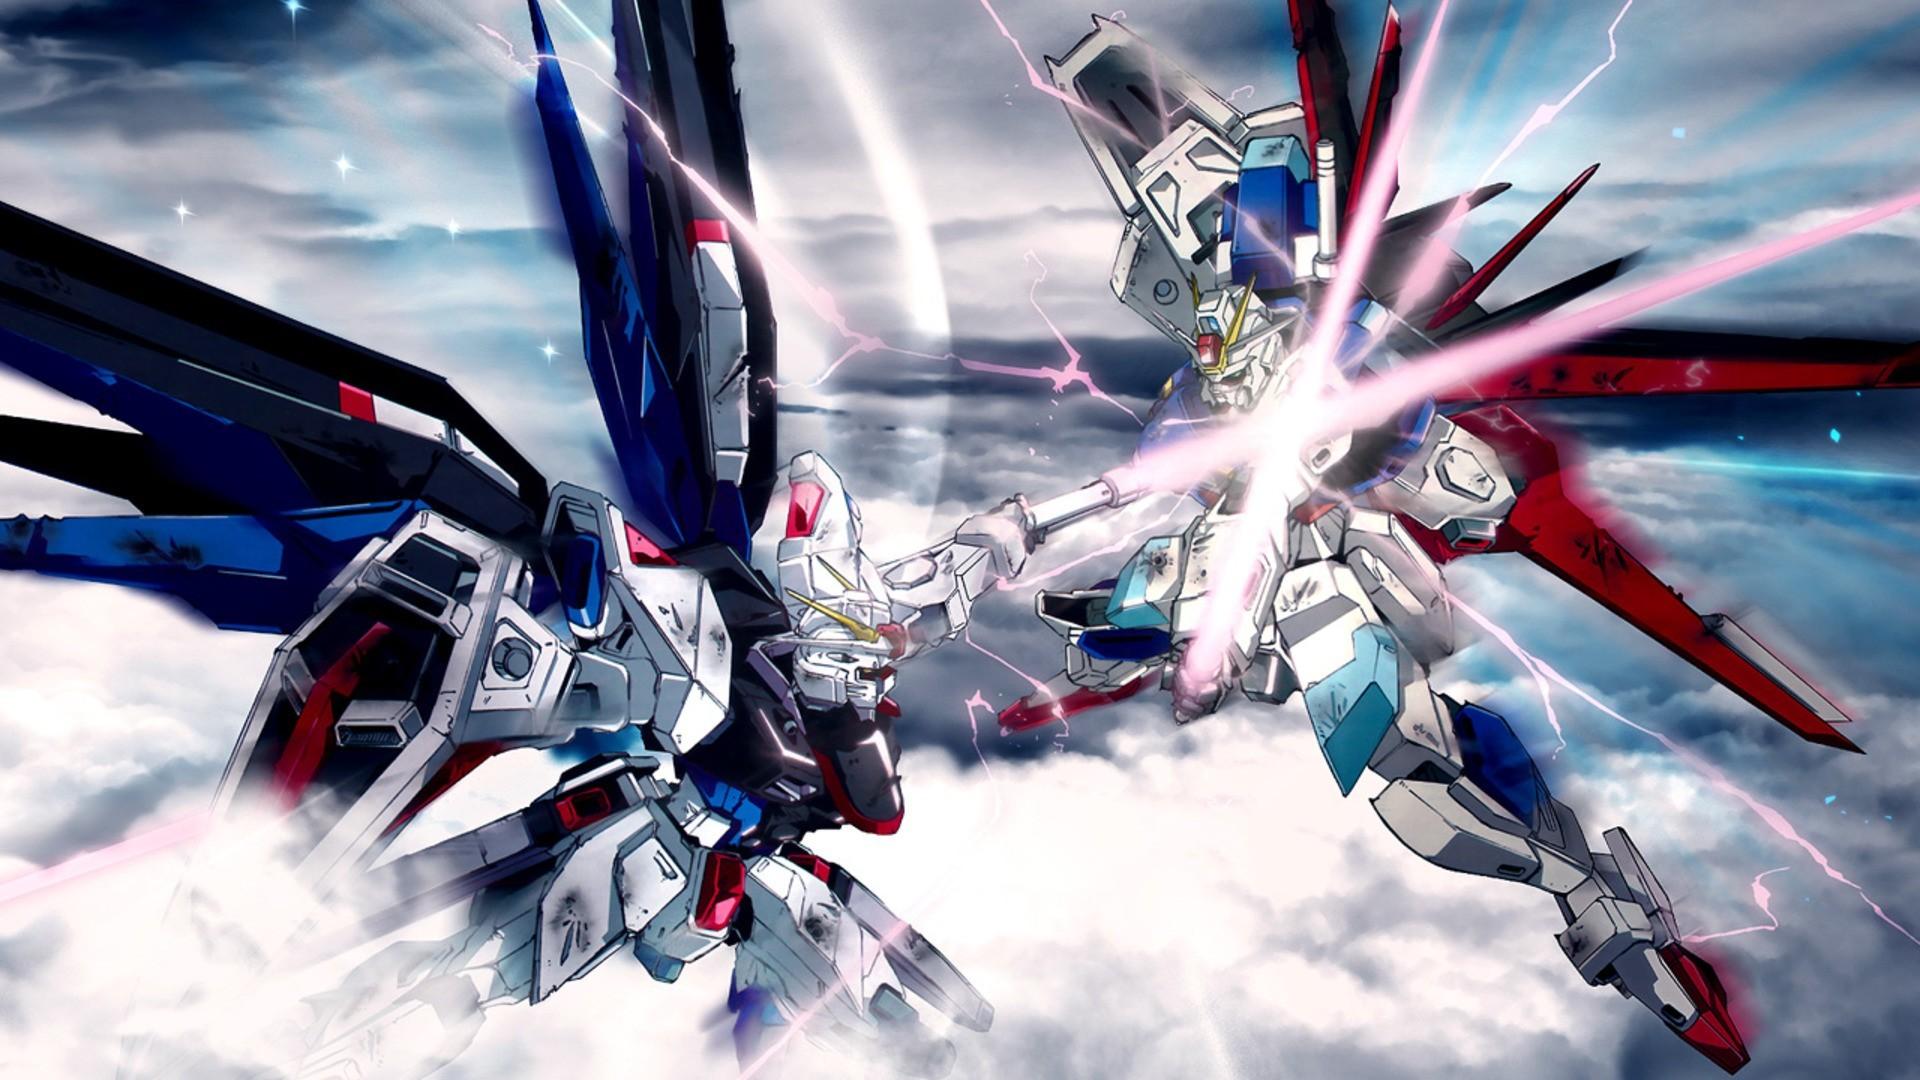 Gundam Deathscythe Images at Movies Monodomo 1920x1080